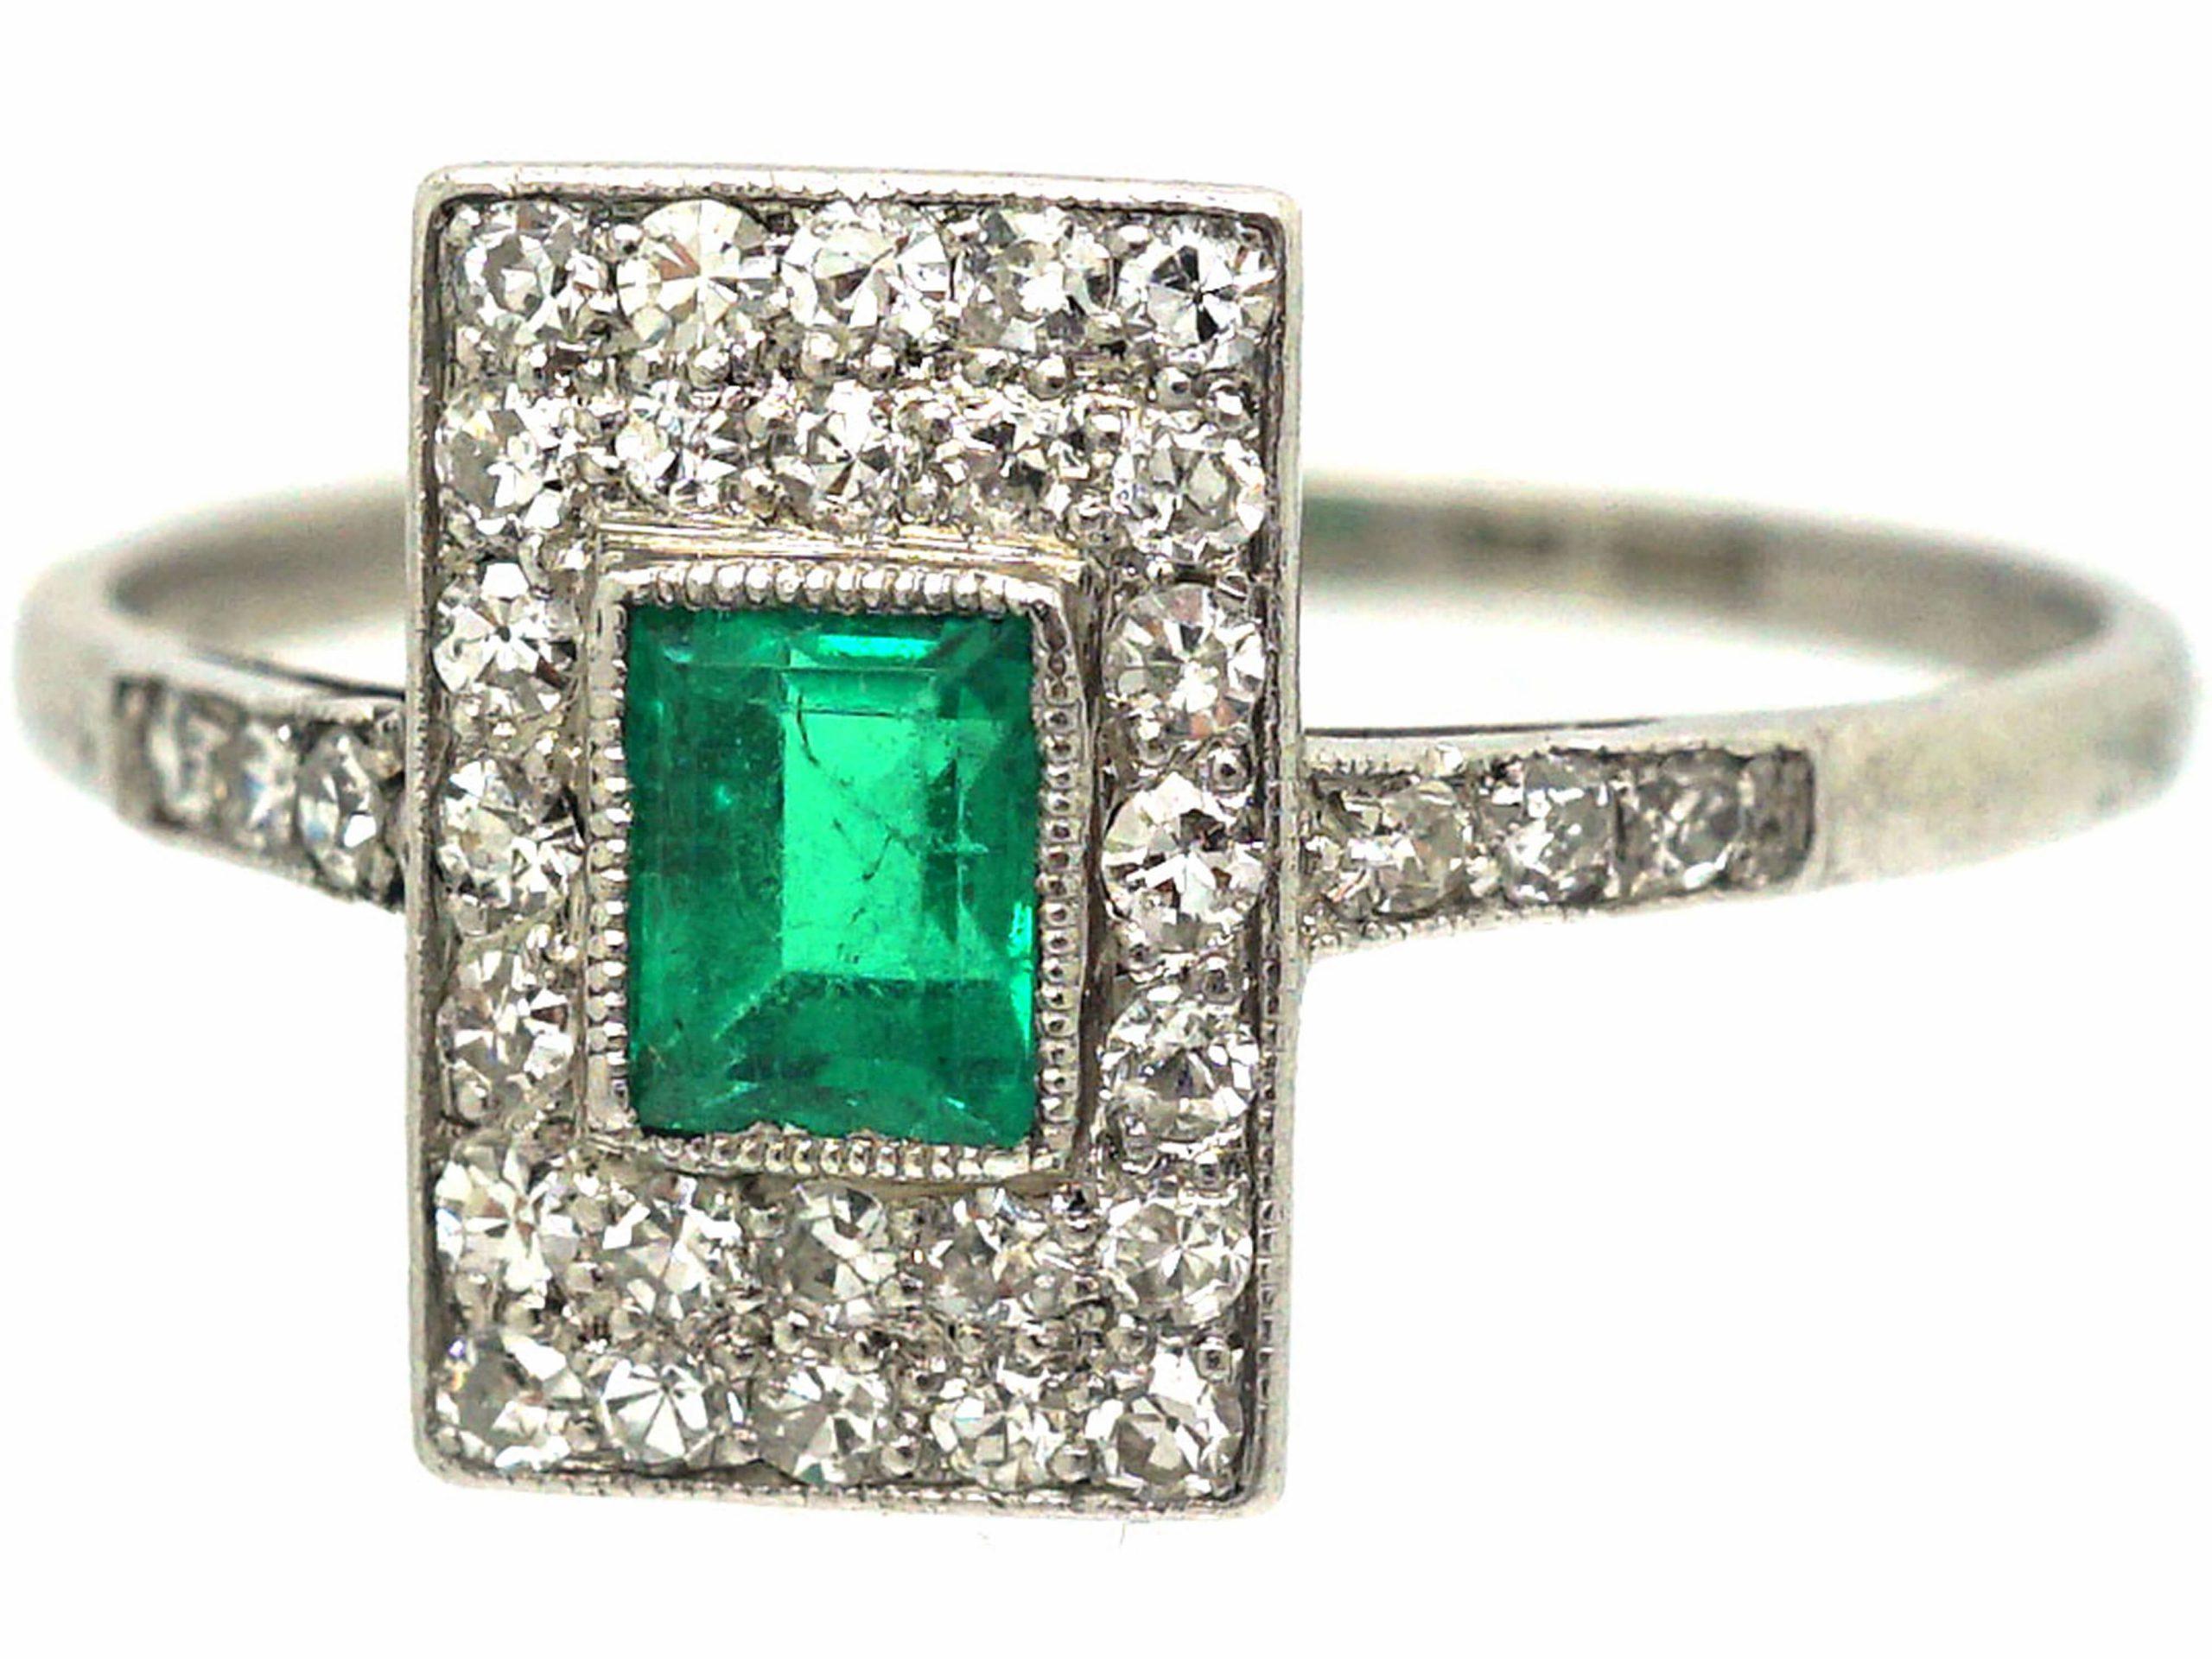 Art Deco Platinum, Emerald & Diamond Rectangular Ring with Diamond set Shoulders